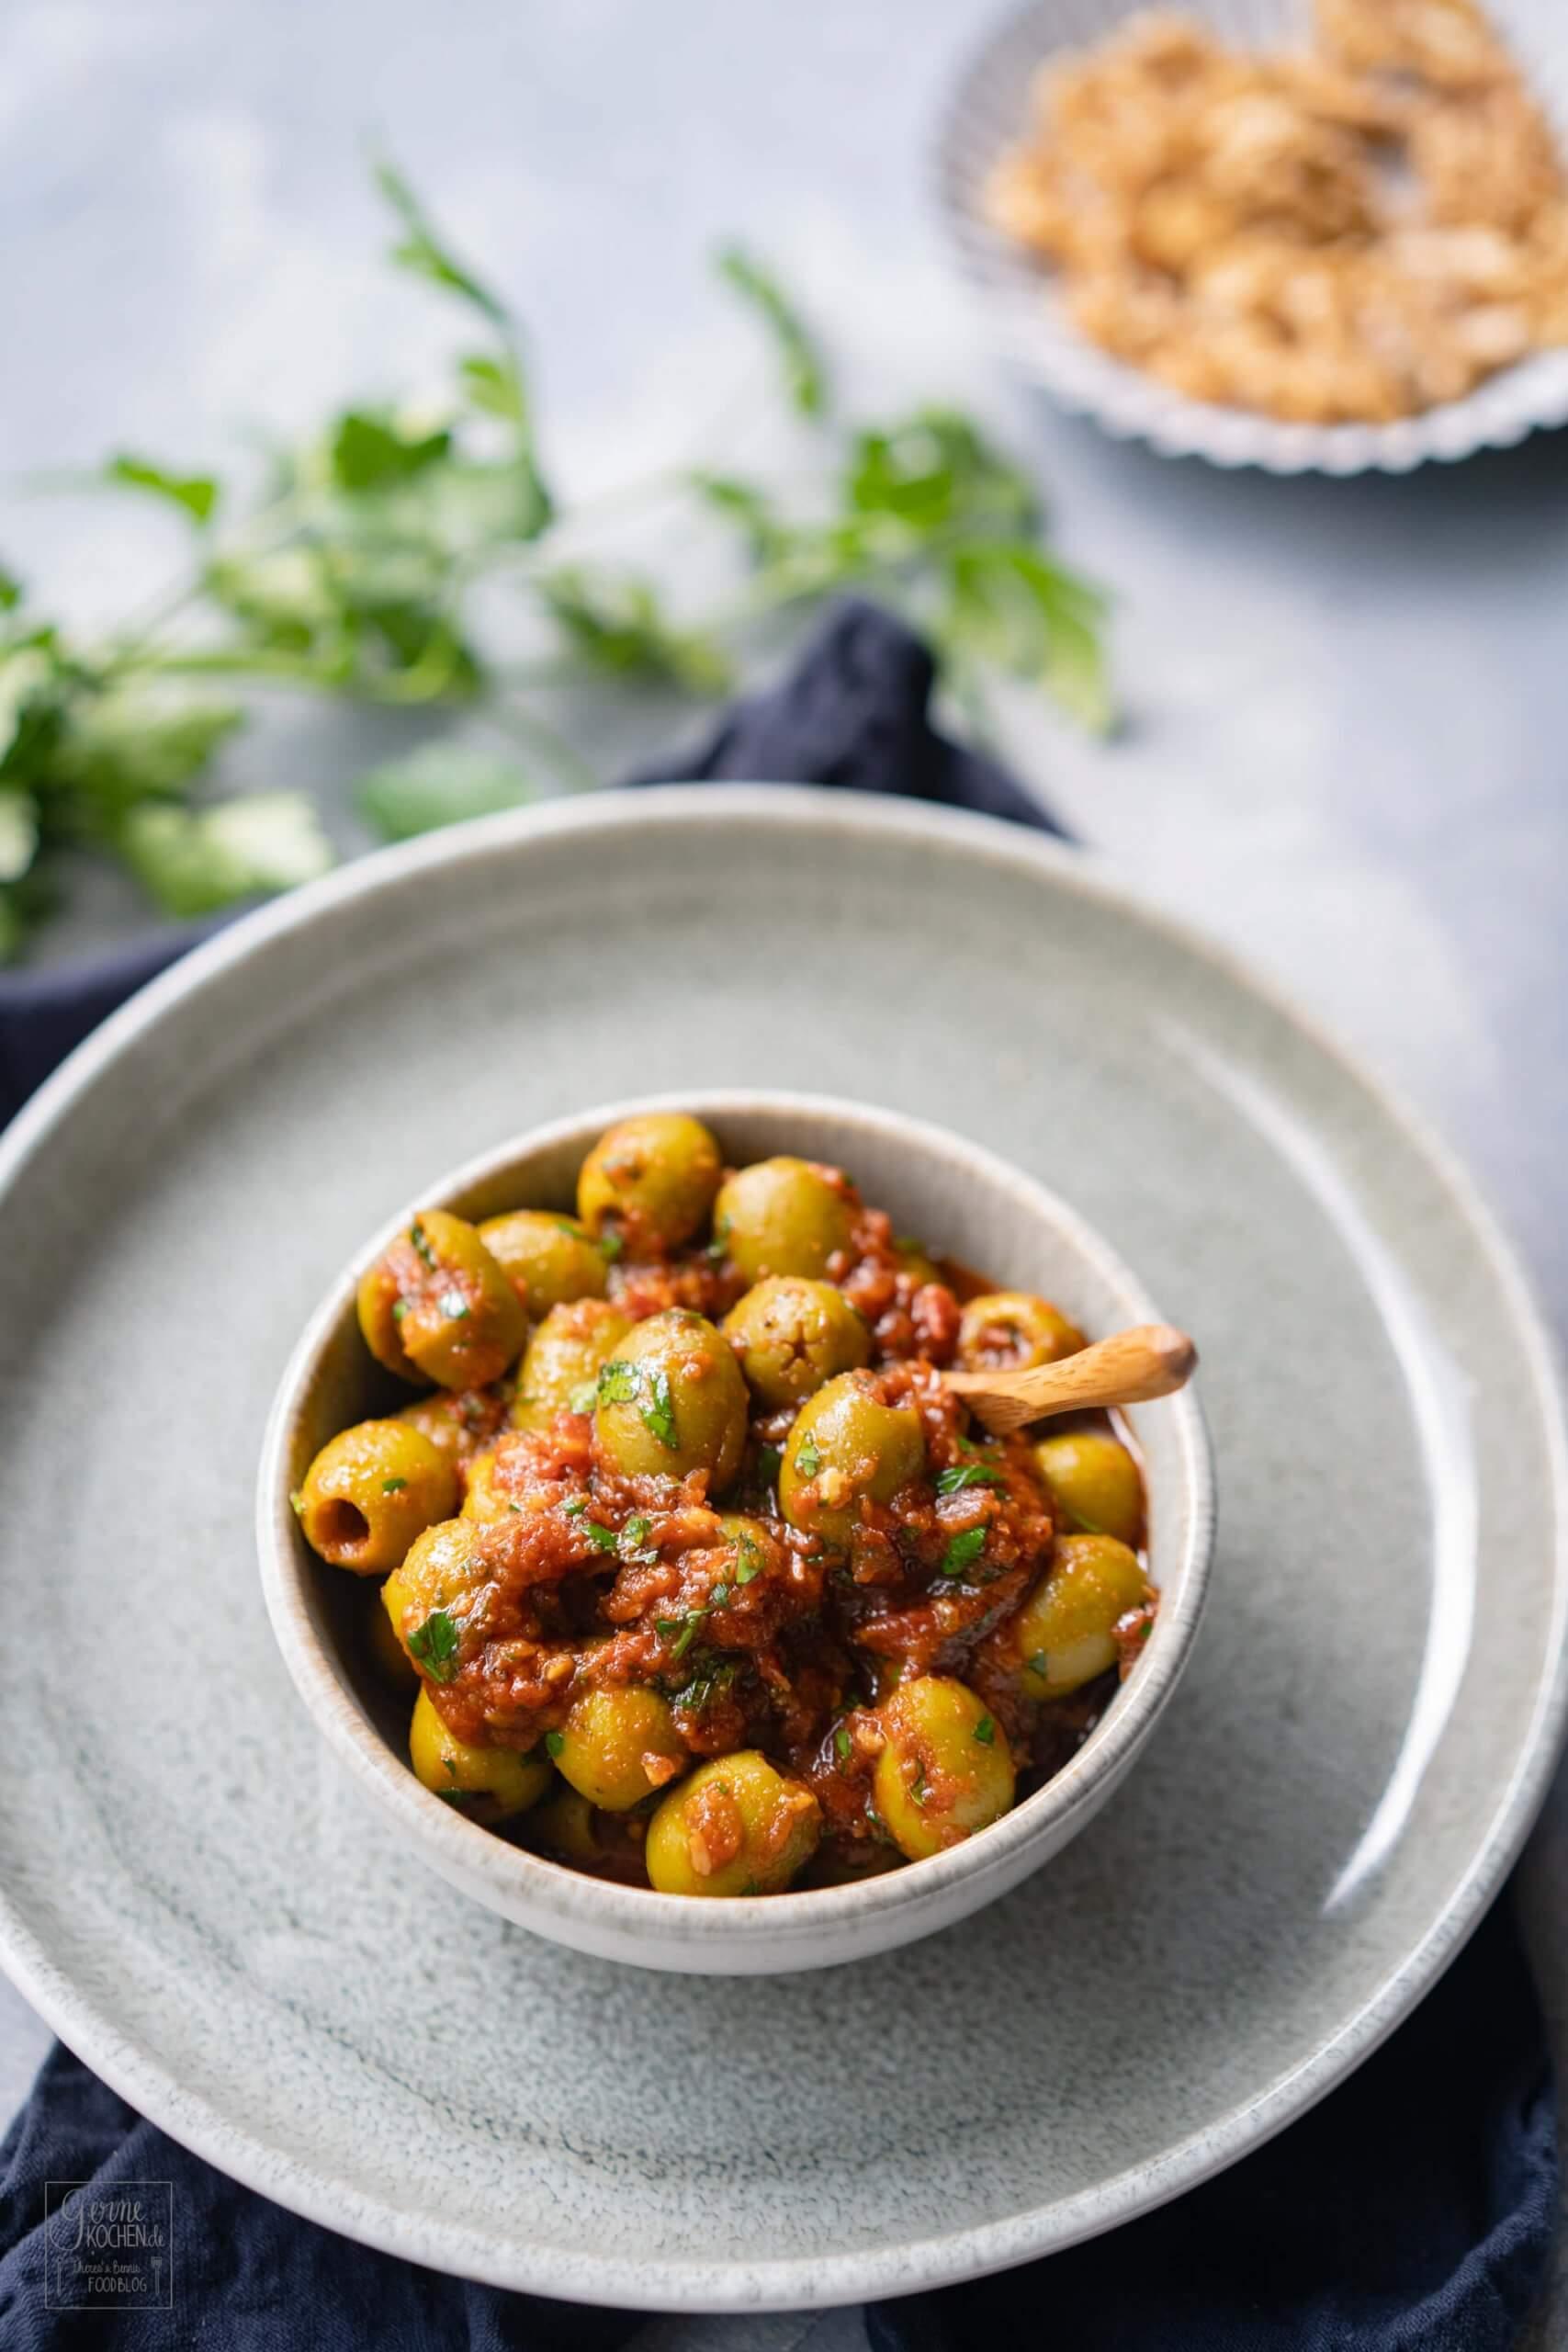 Grüne Oliven in Tomatensauce